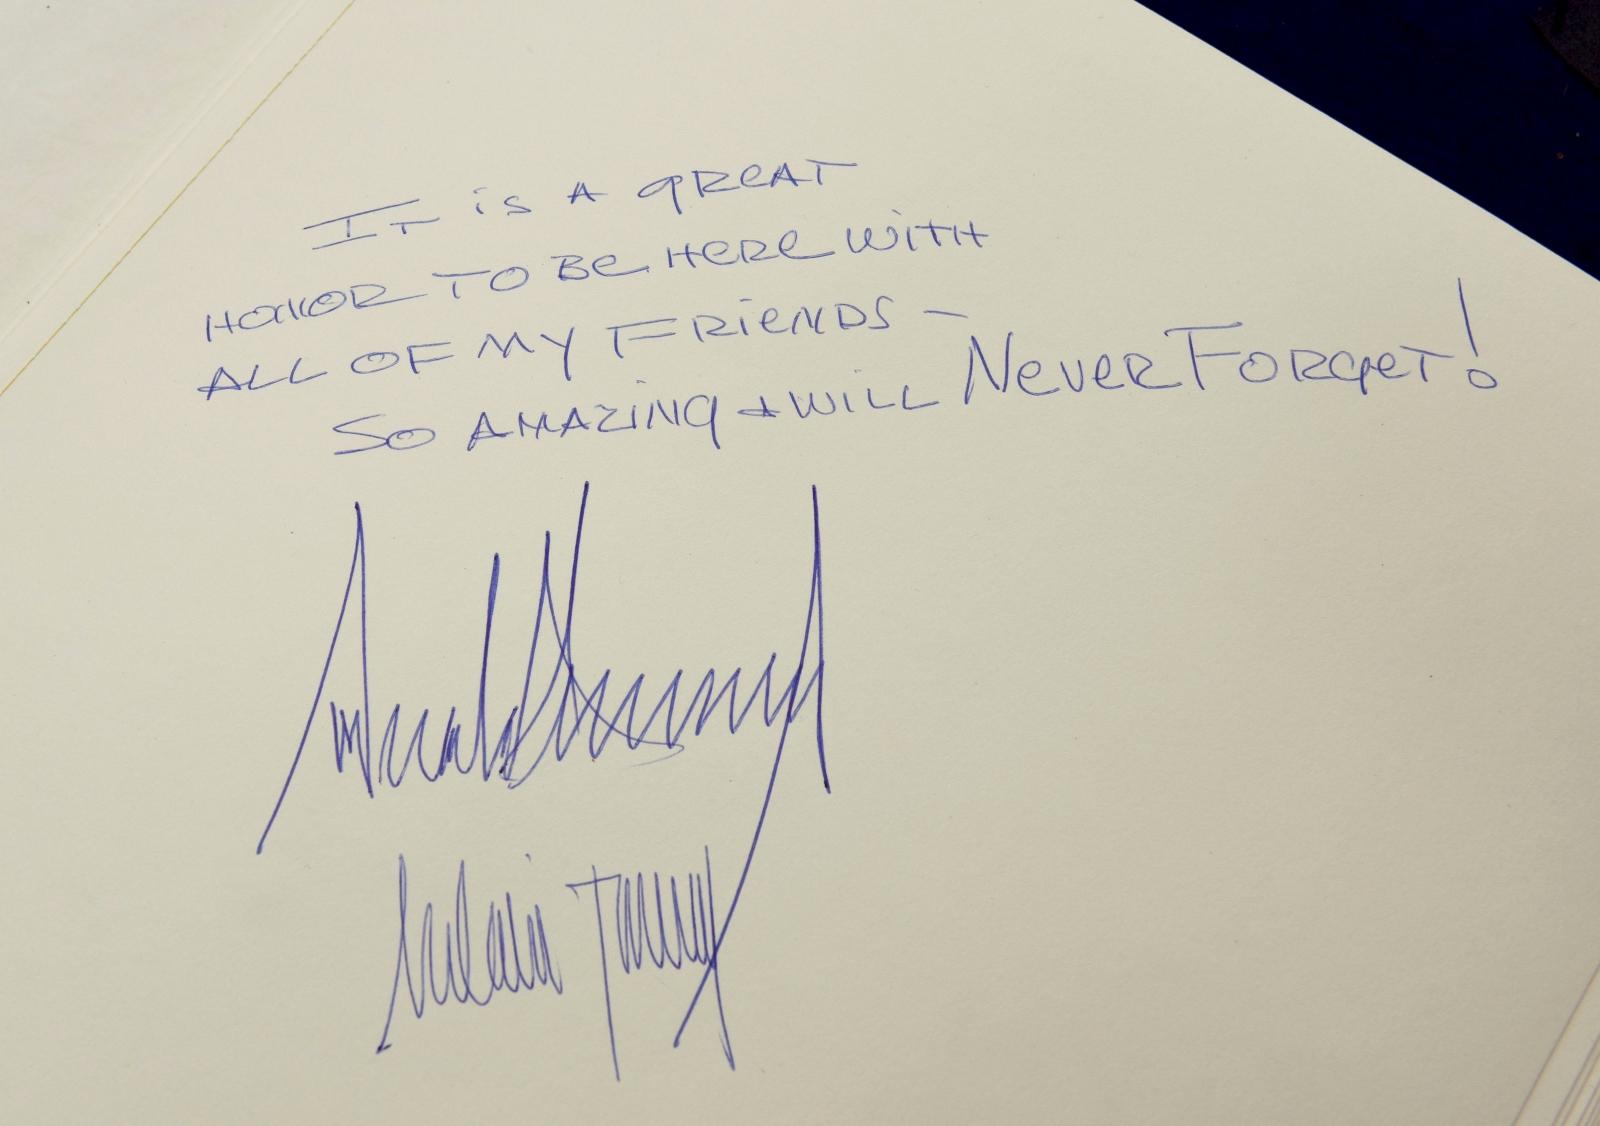 Donald Trumps message at Yad Vashem